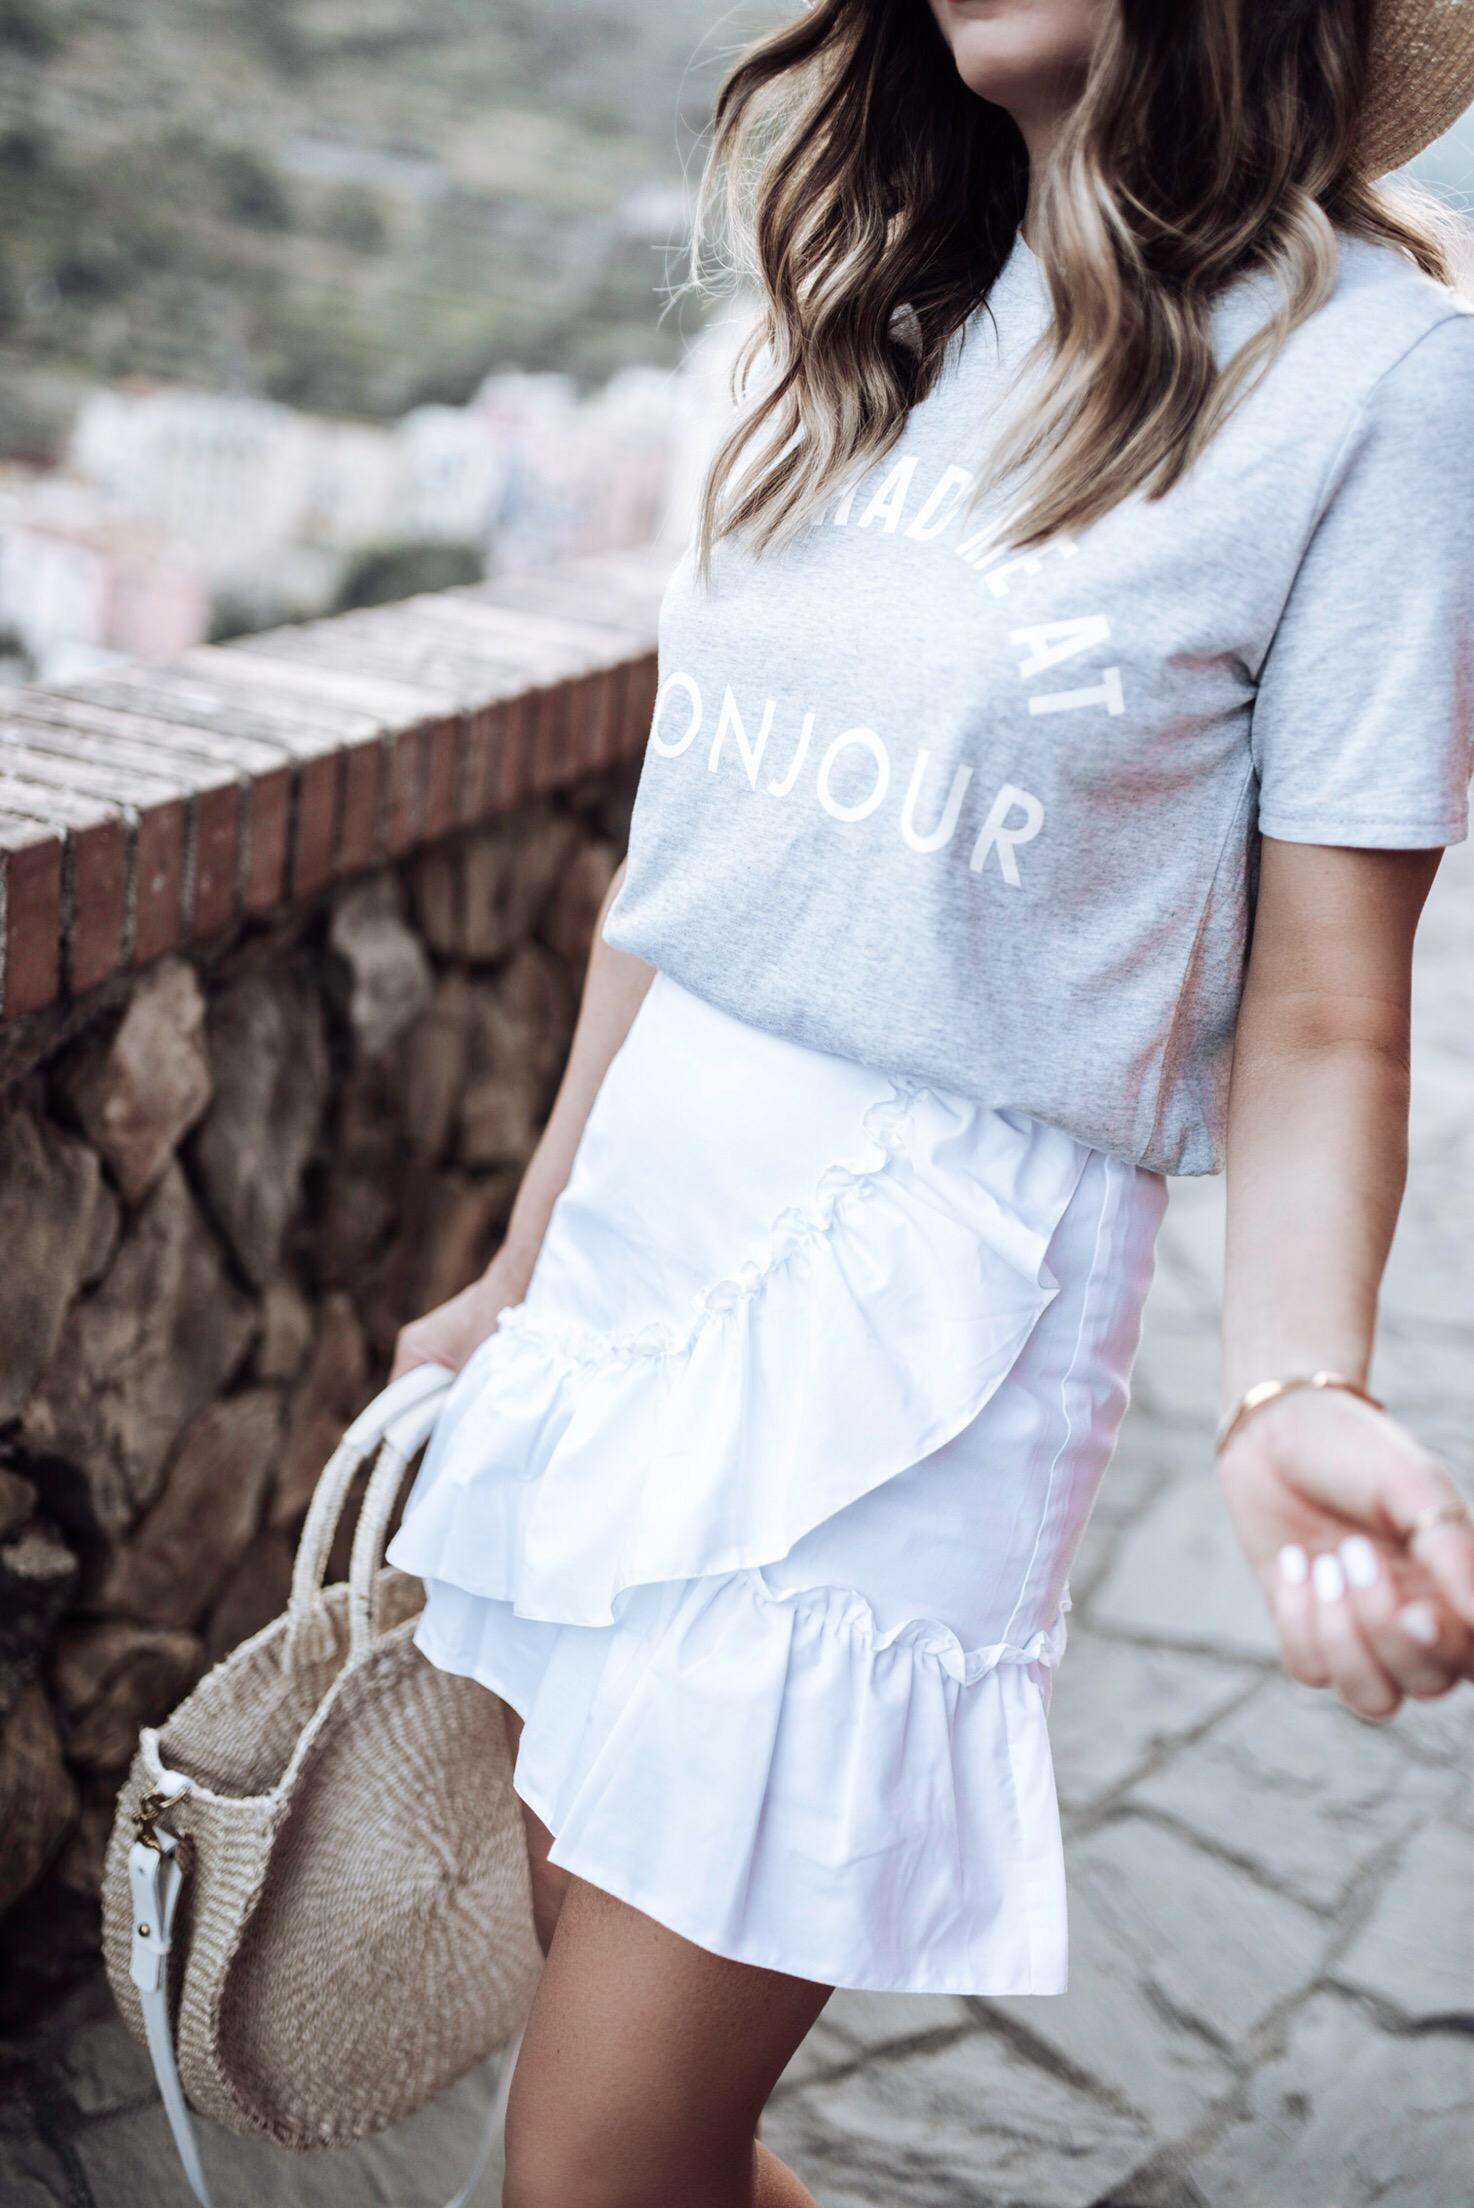 Tiffany Jais Houston fashion and lifestyle blogger of Flaunt and Center | Houston fashion blogger | ruffle skirt | 2017 summer fashion trends